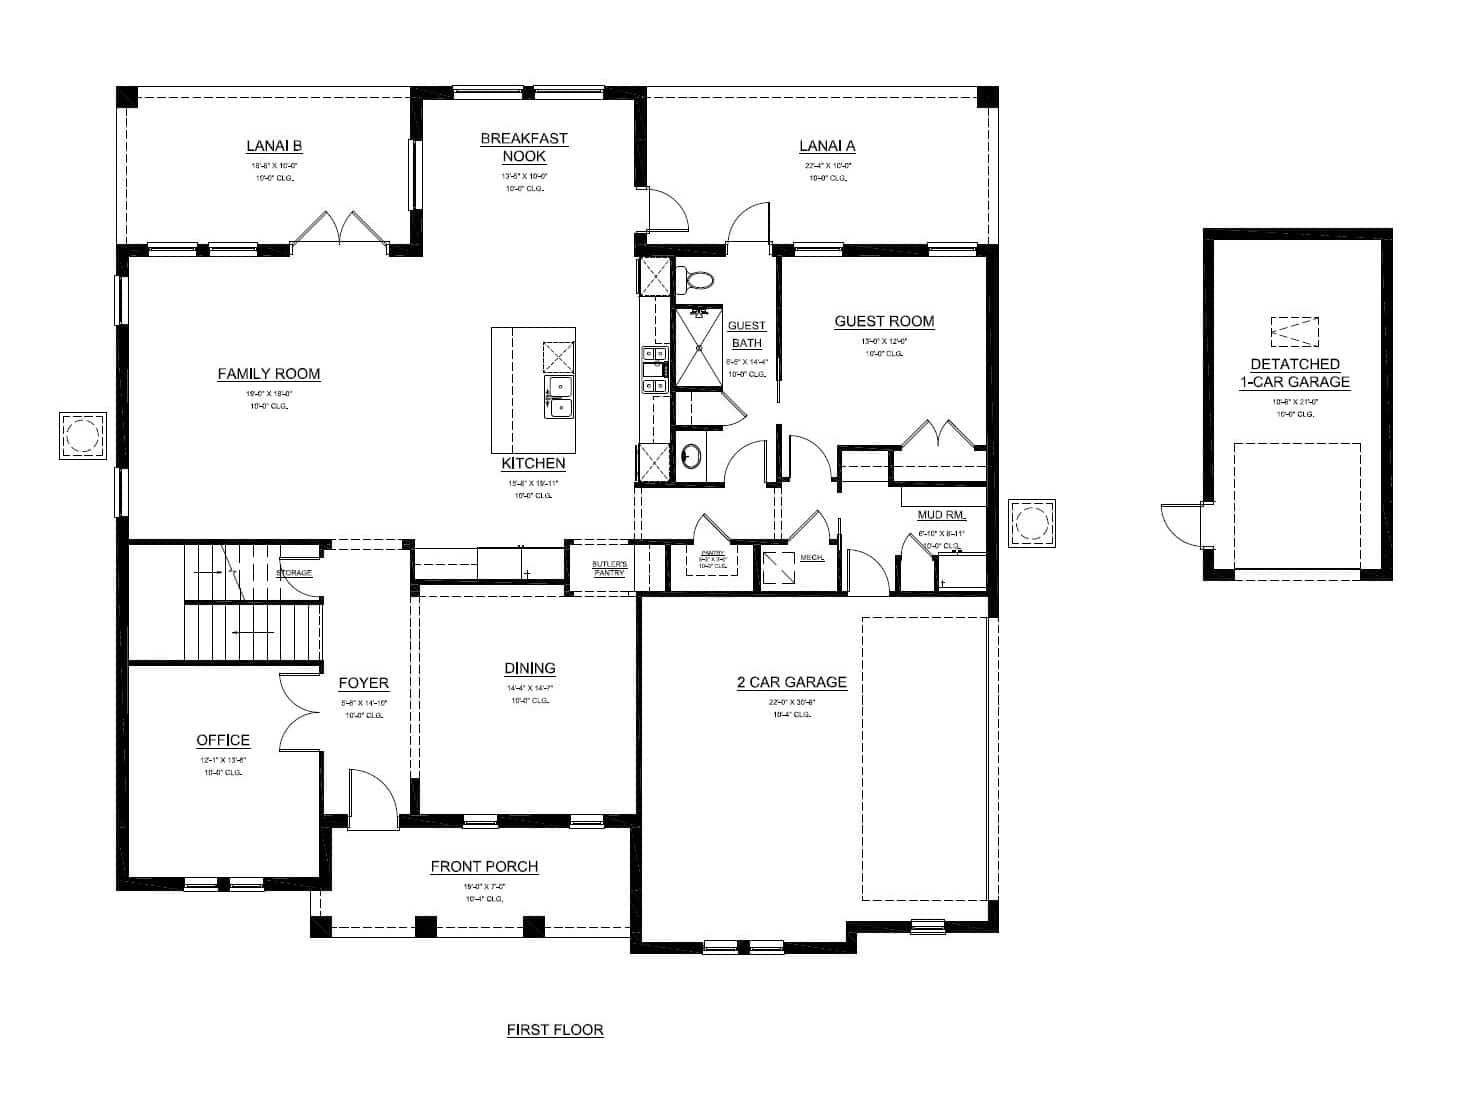 St thomas turain signature homes for Signature home designs